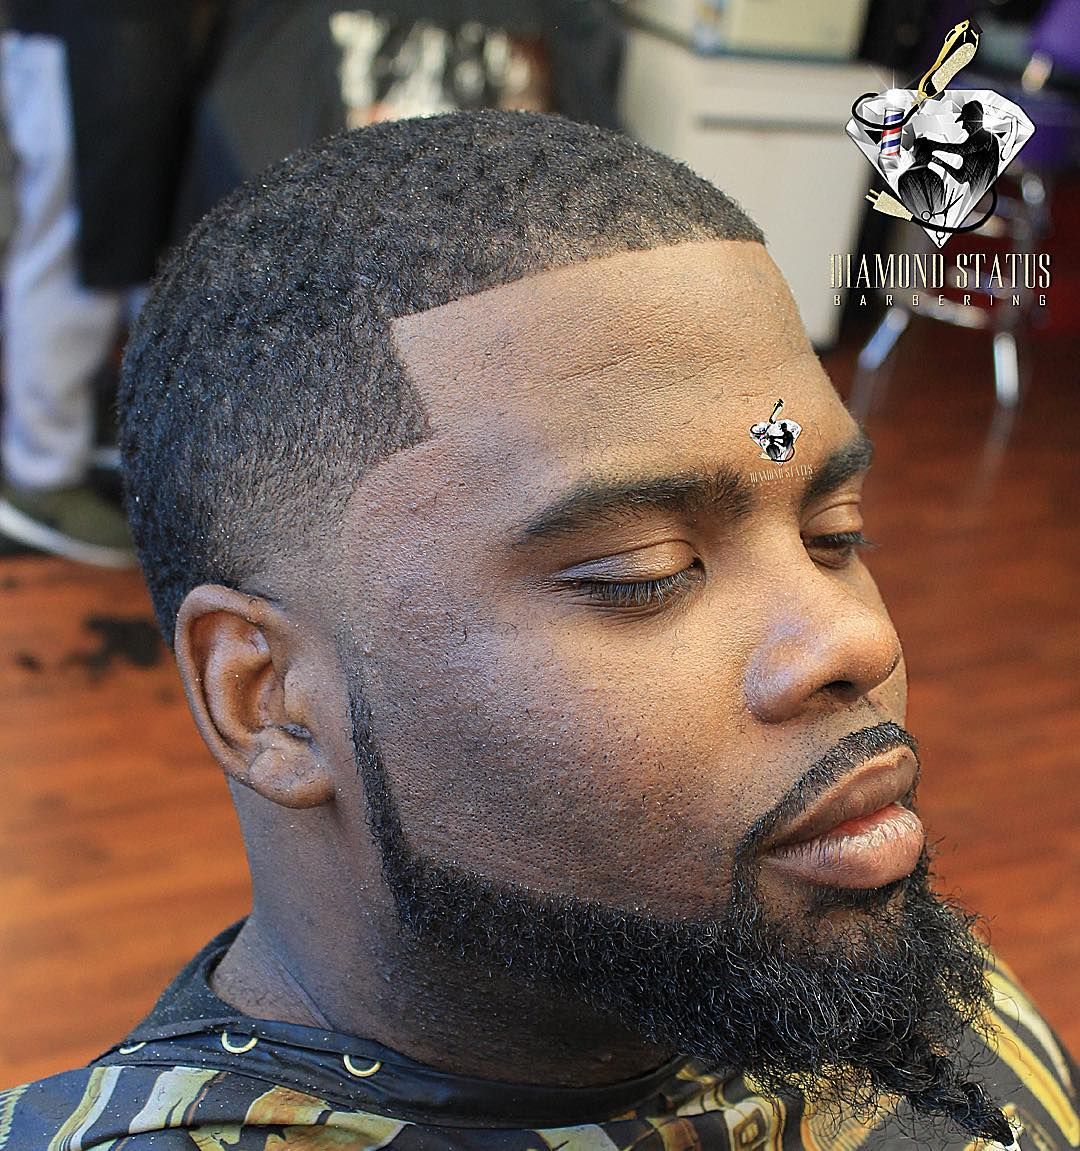 Fade haircuts for black men haircut by diamondstatusbarbering iftnnxeji menshair